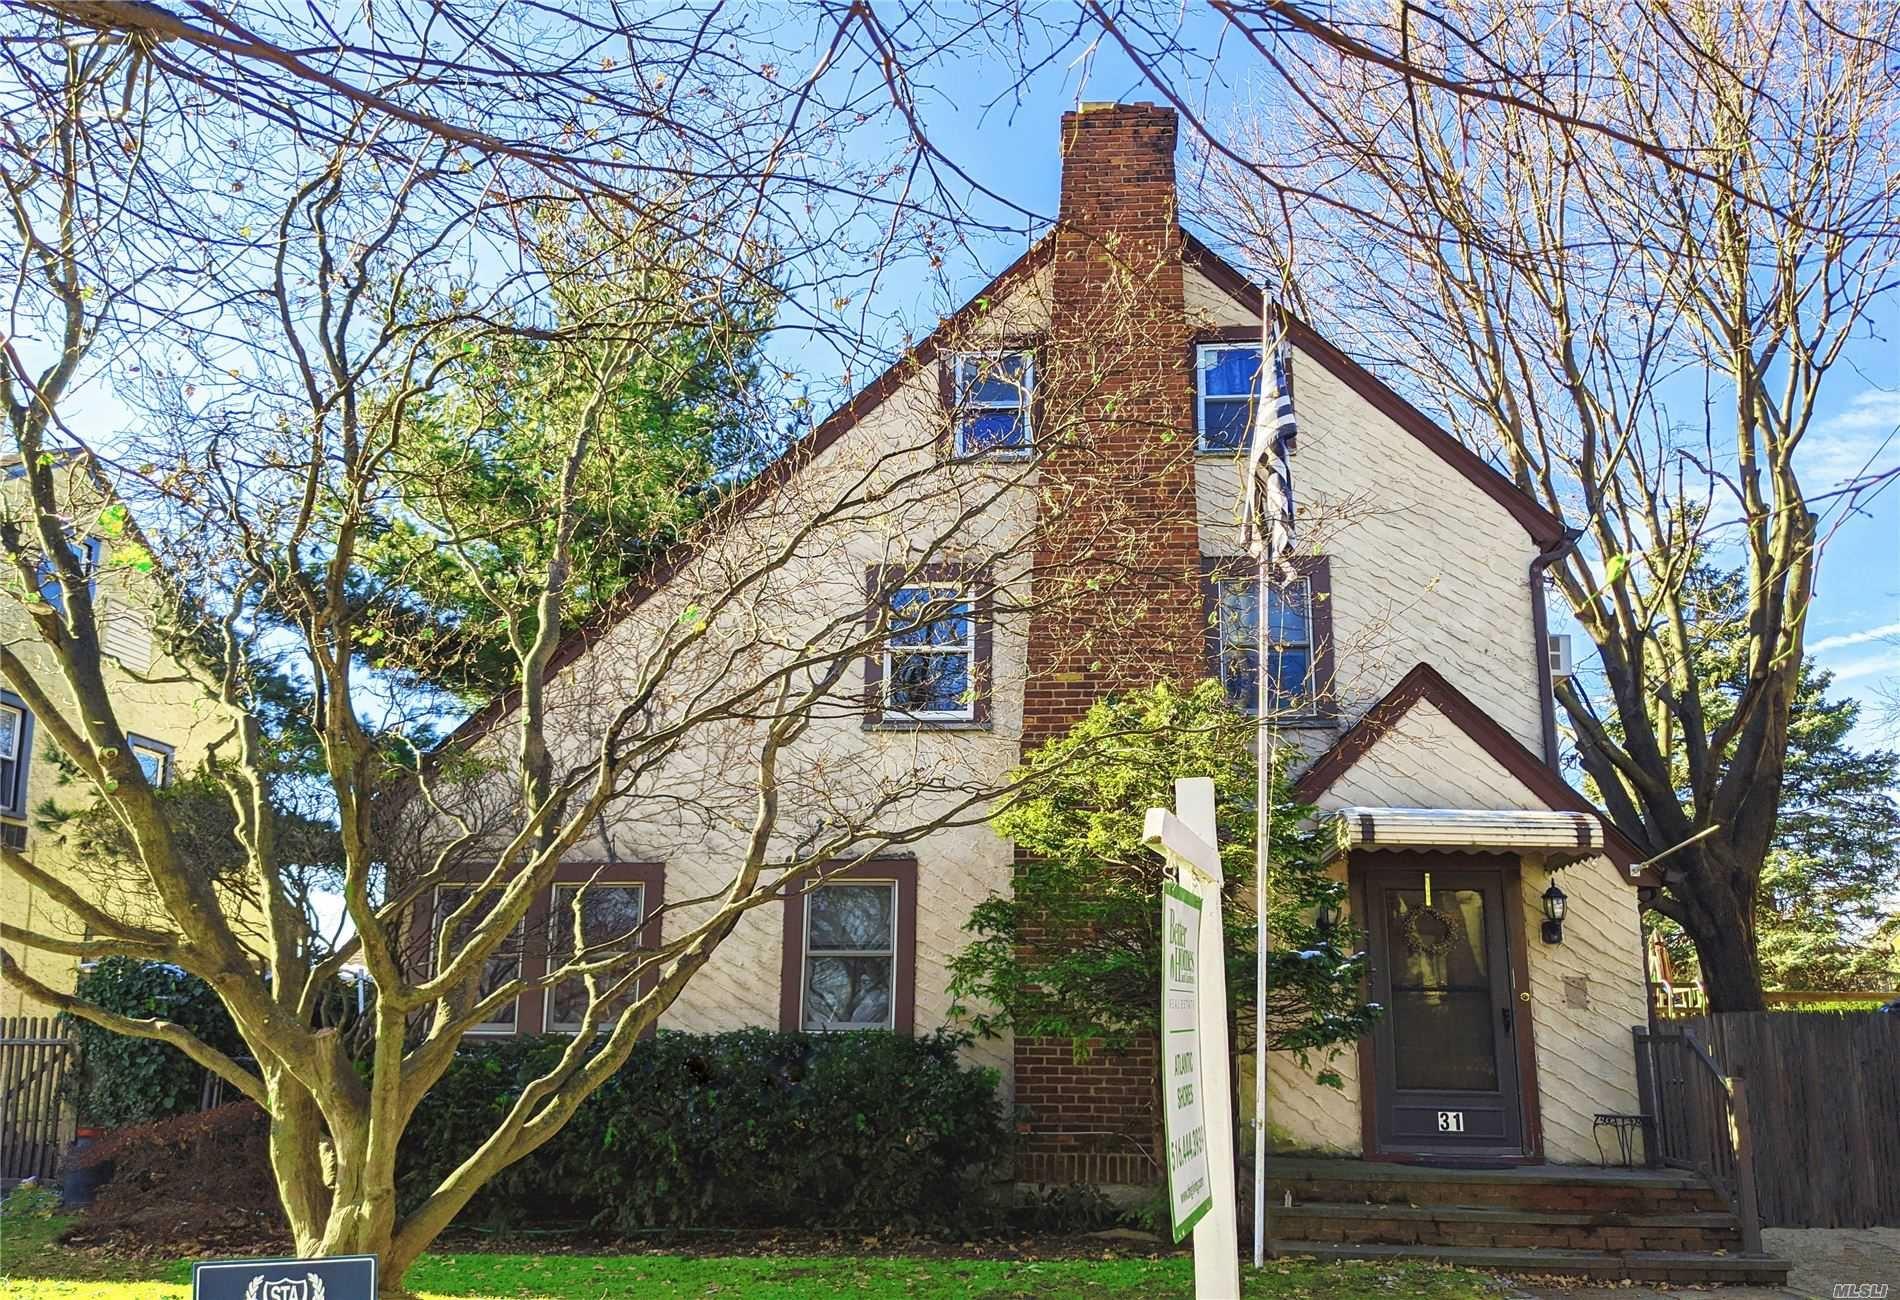 31 Marlborough Road, West Hempstead, NY 11552 - MLS#: 3185613